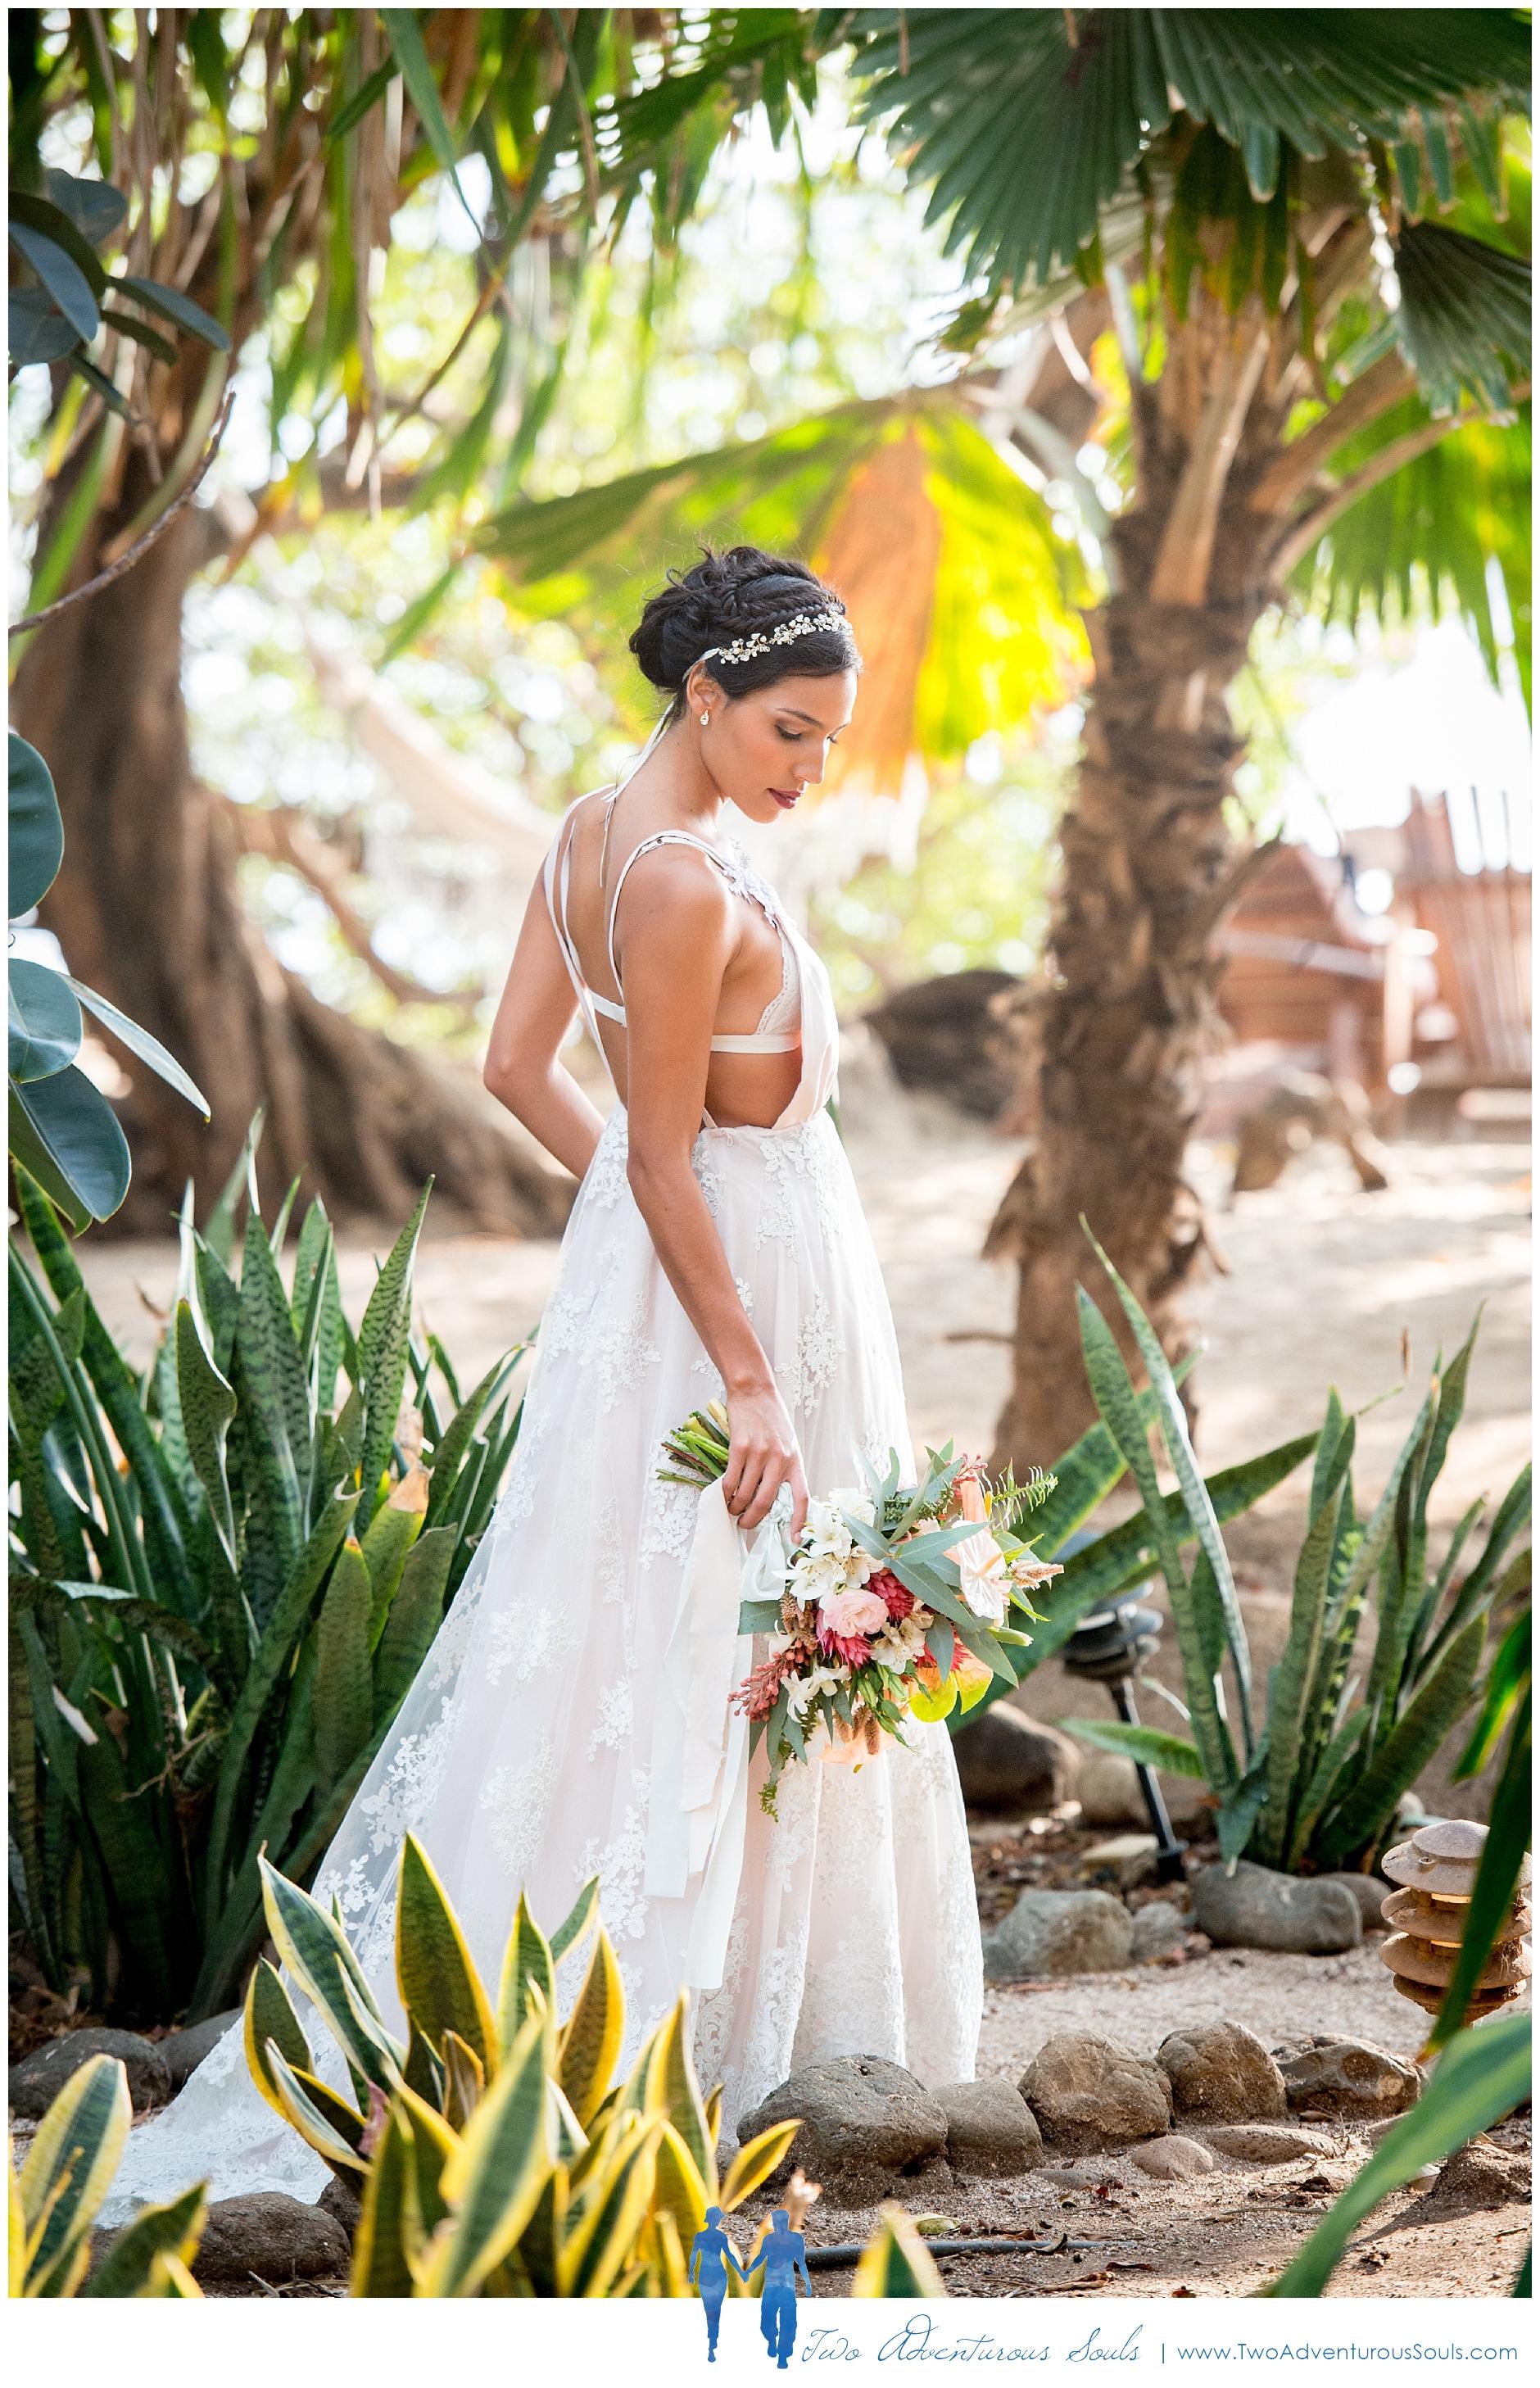 Costa Rica Wedding Photographers, Destination Wedding Photographers, Two Adventurous Souls - Tamarindo Wedding, Playa Langosta, Sueno del Mar Wedding